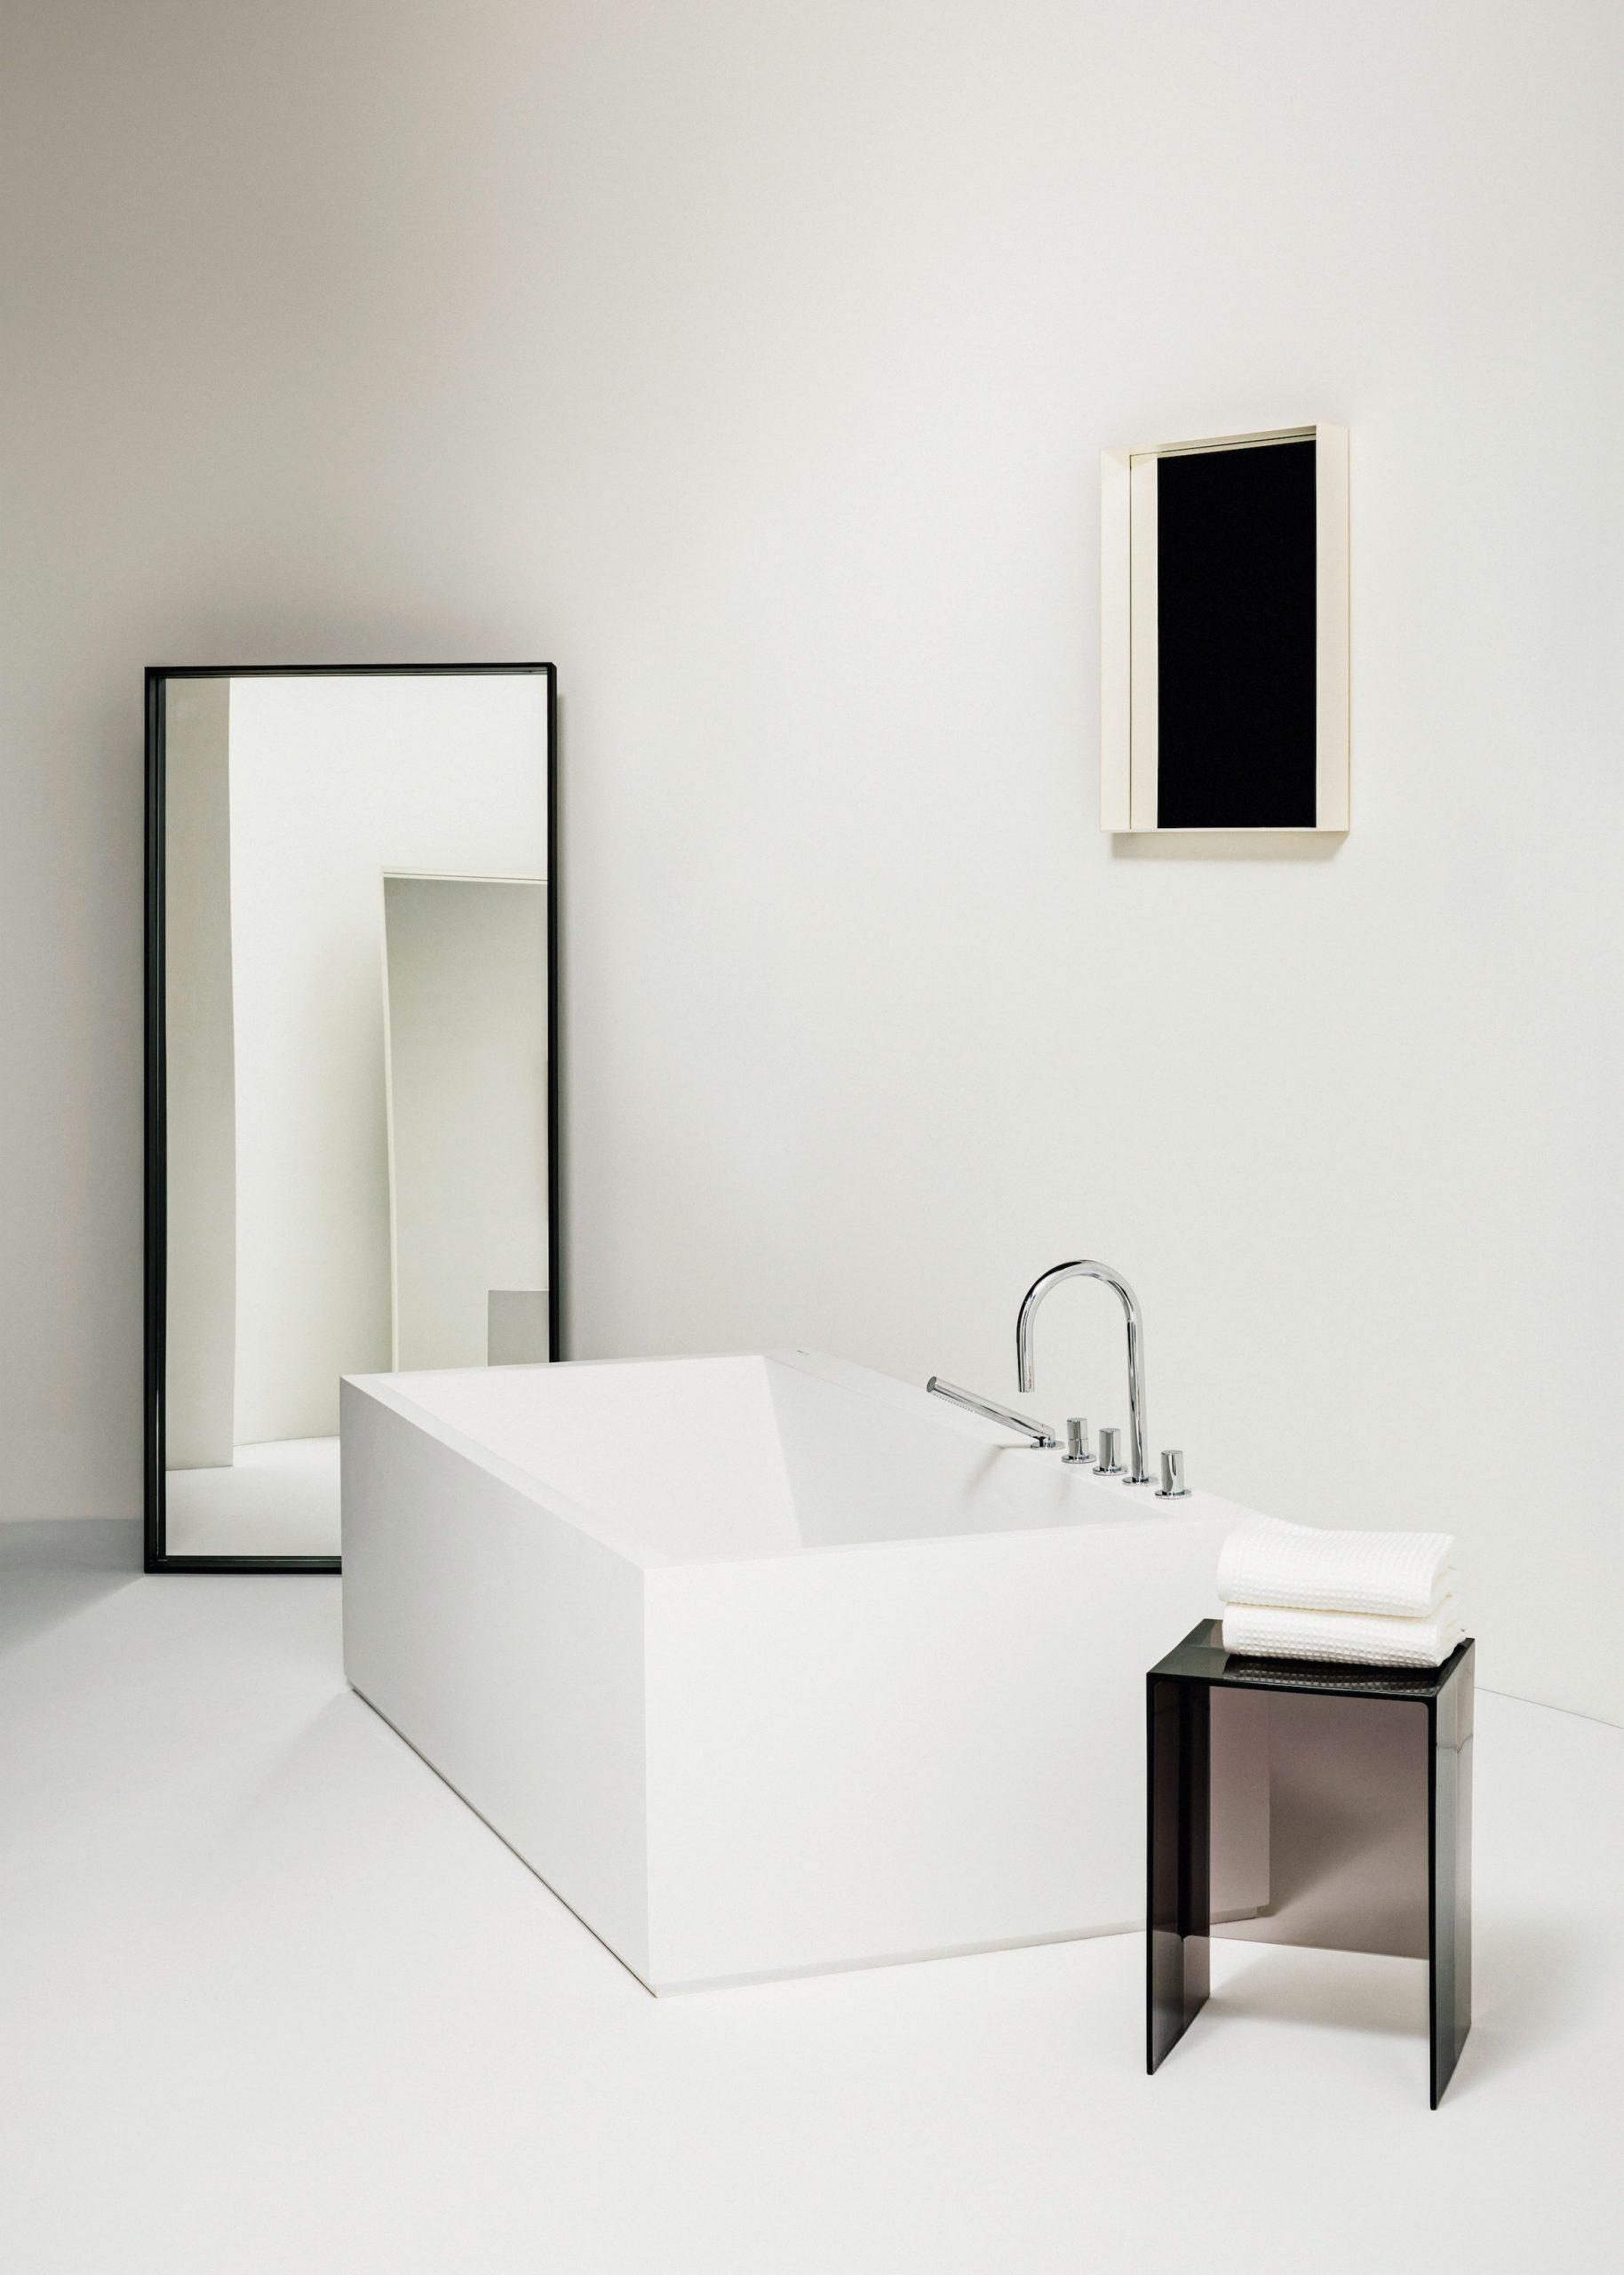 A white bathroom with a freestanding bathtub